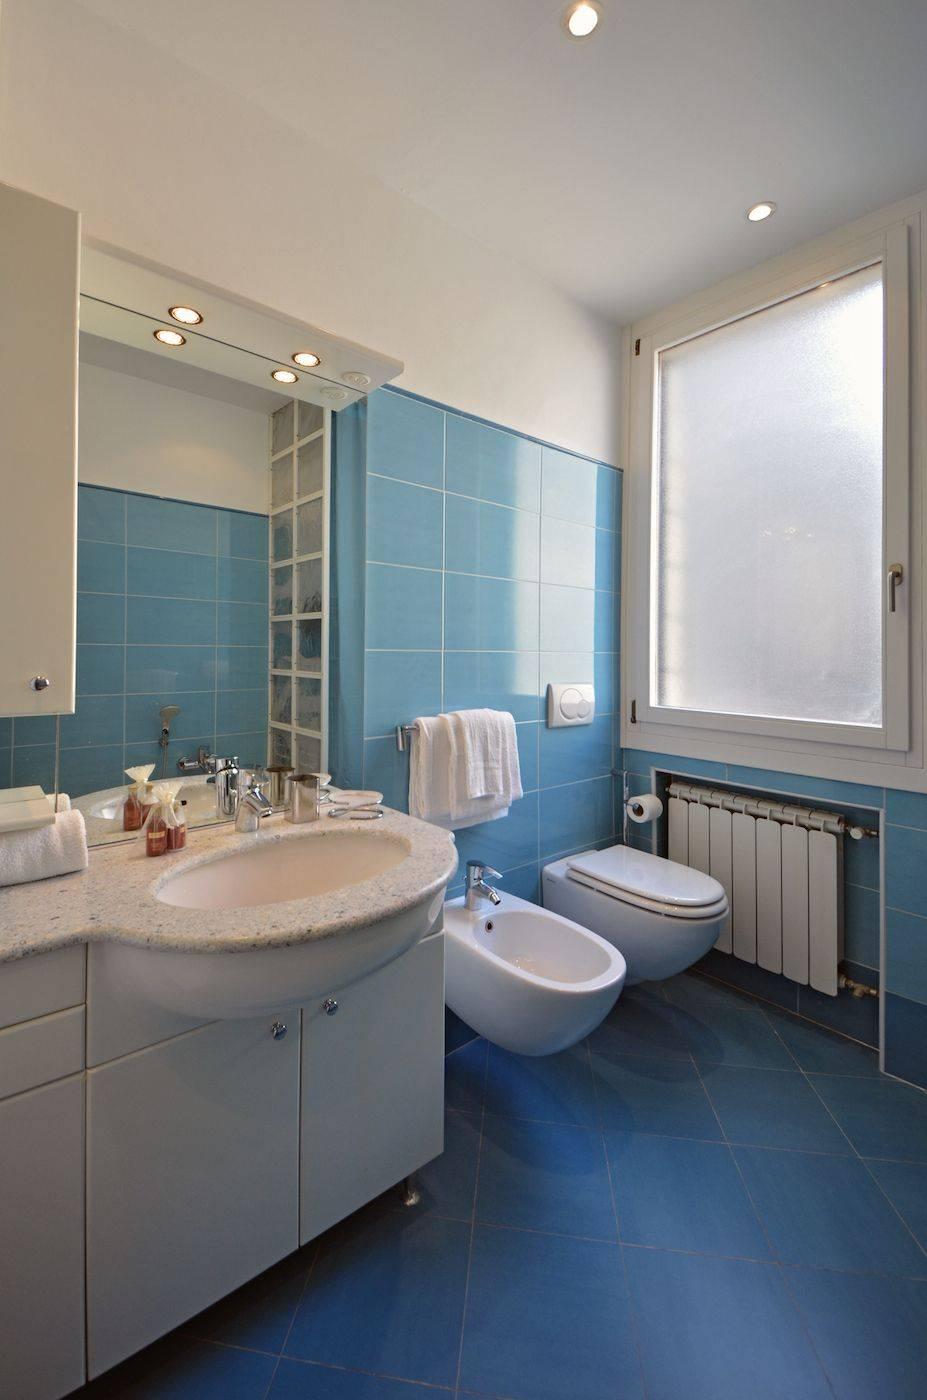 large bathroom with bathtub and washing machine